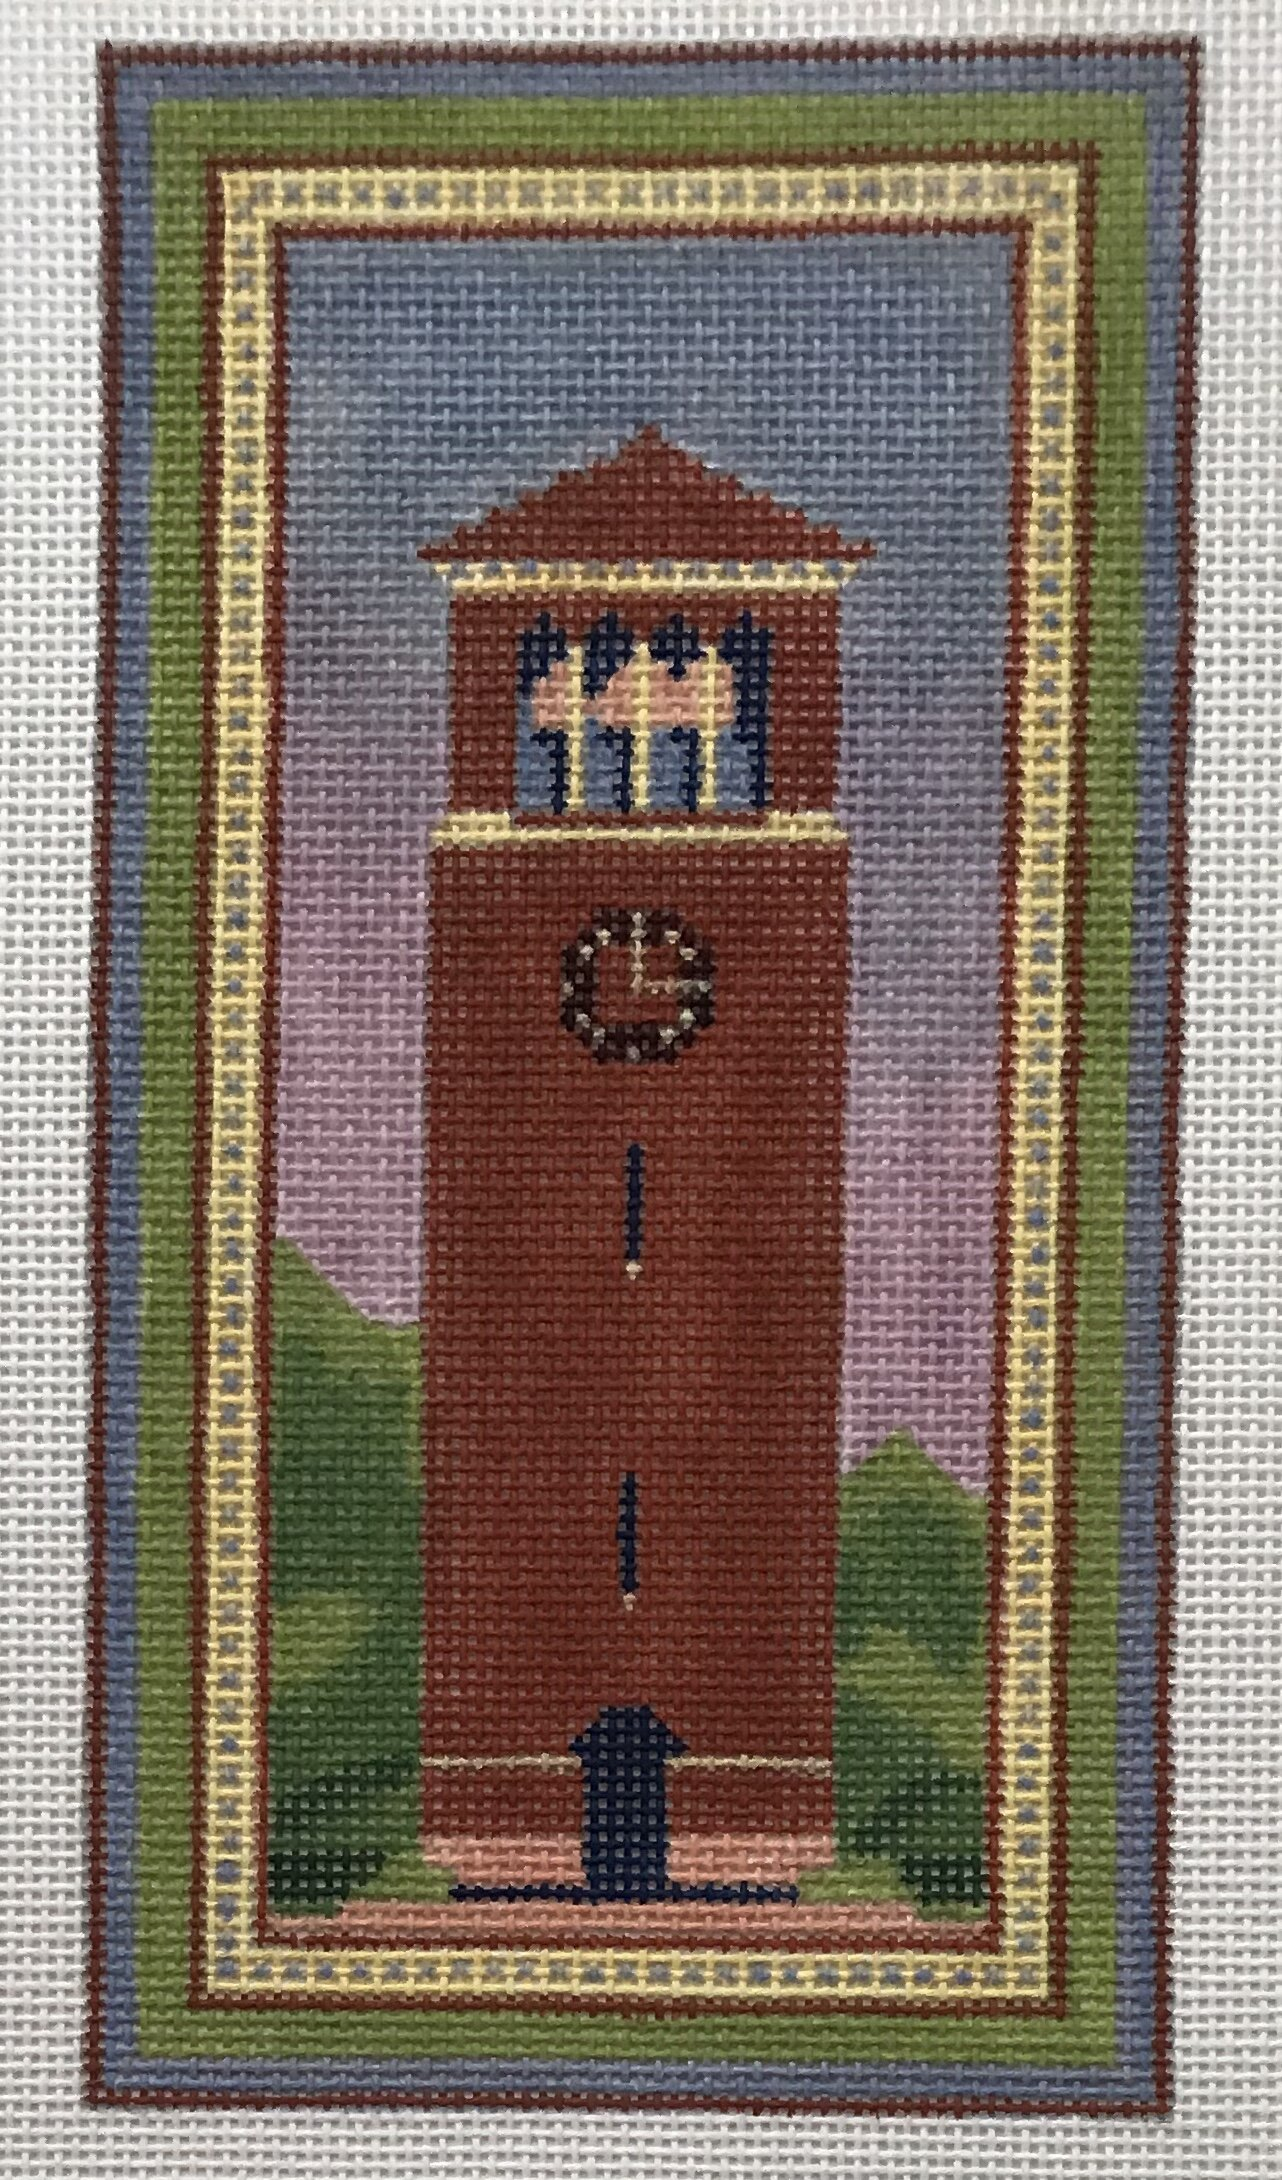 "Bell Tower - Chautauqua ALBT-1   3.5"" x 7"" on 18 mesh"